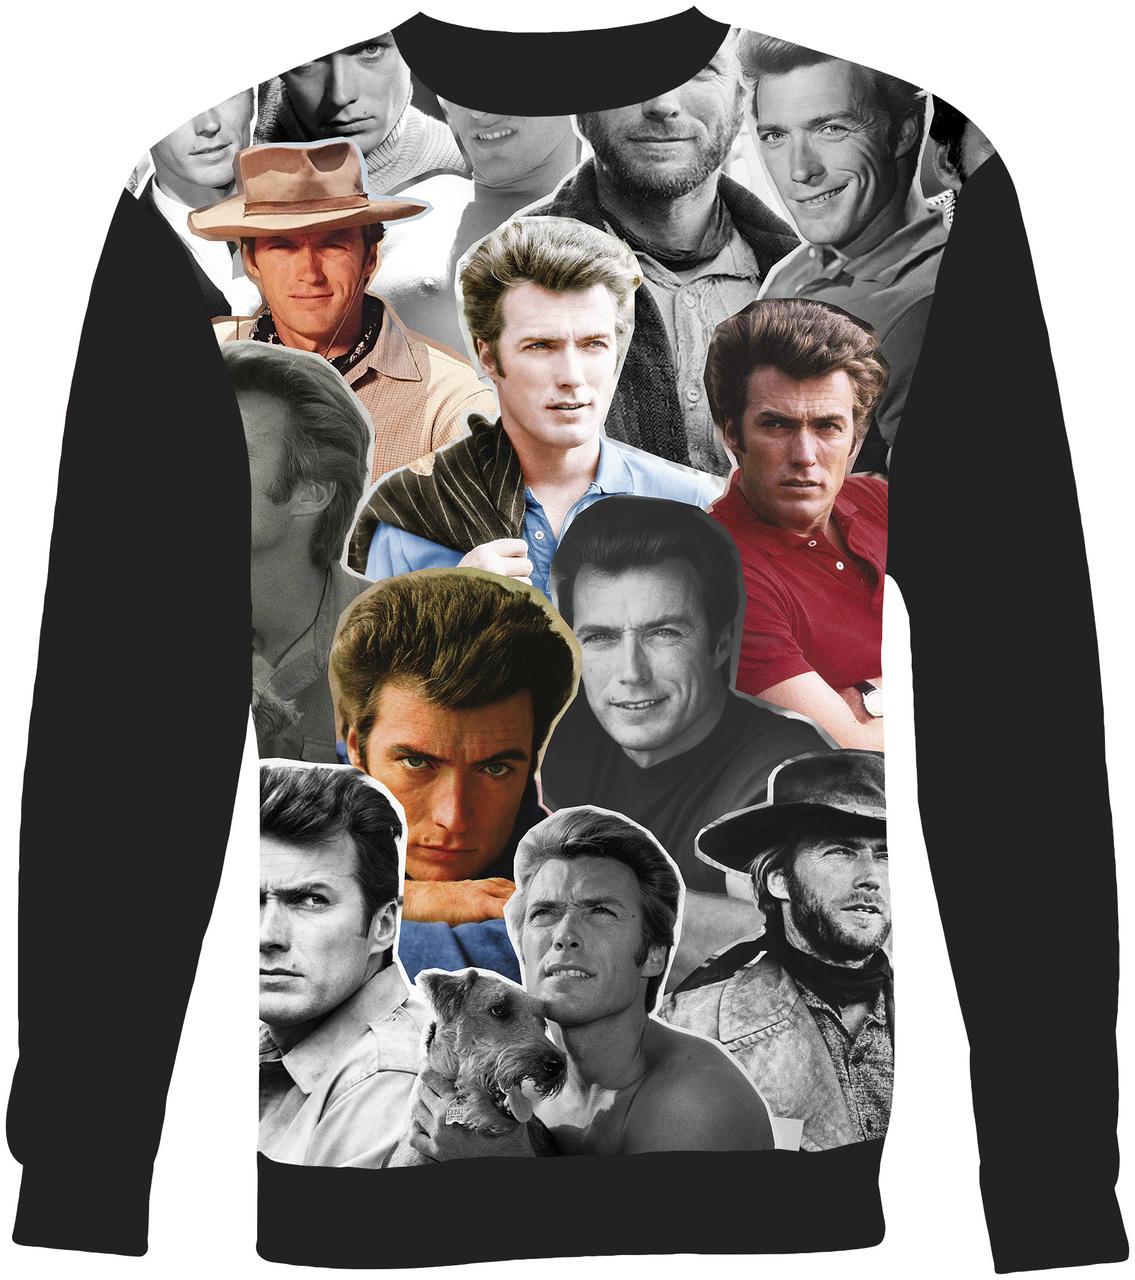 Scott Eastwood Photo Collage T-Shirt